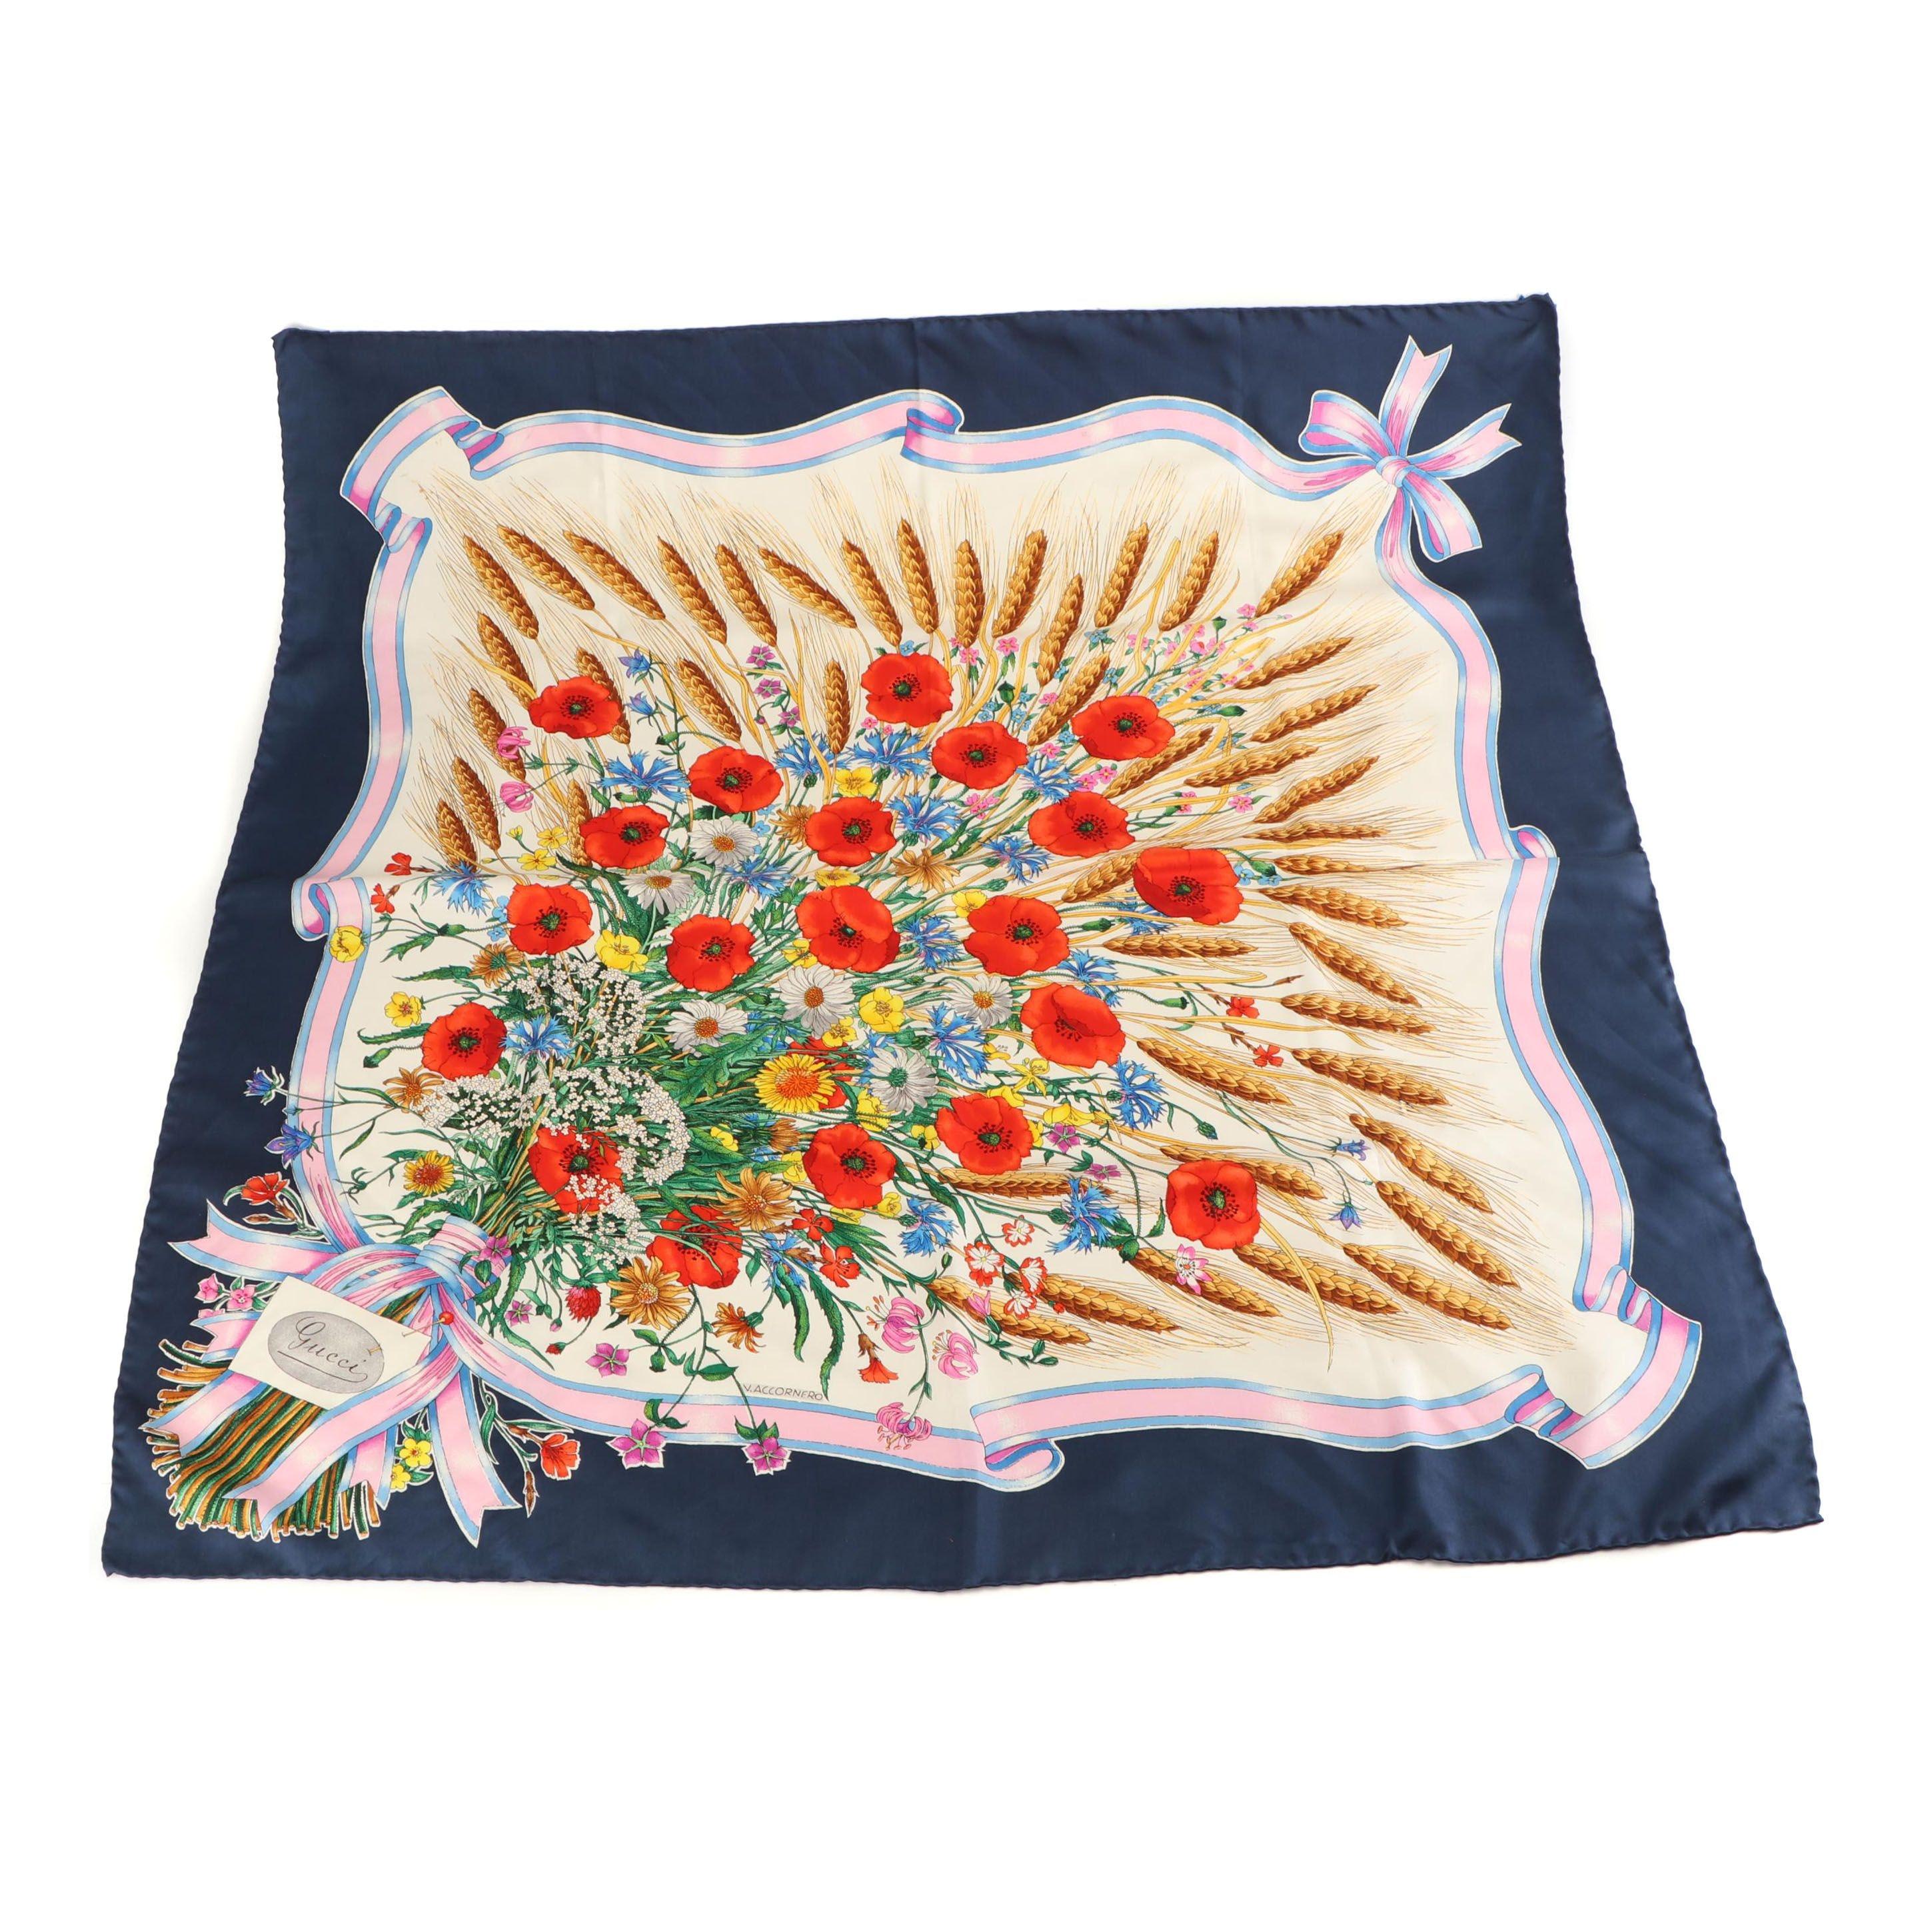 Gucci Floral Print Silk Scarf Designed by Vittorio Accornero, 1970s Vintage